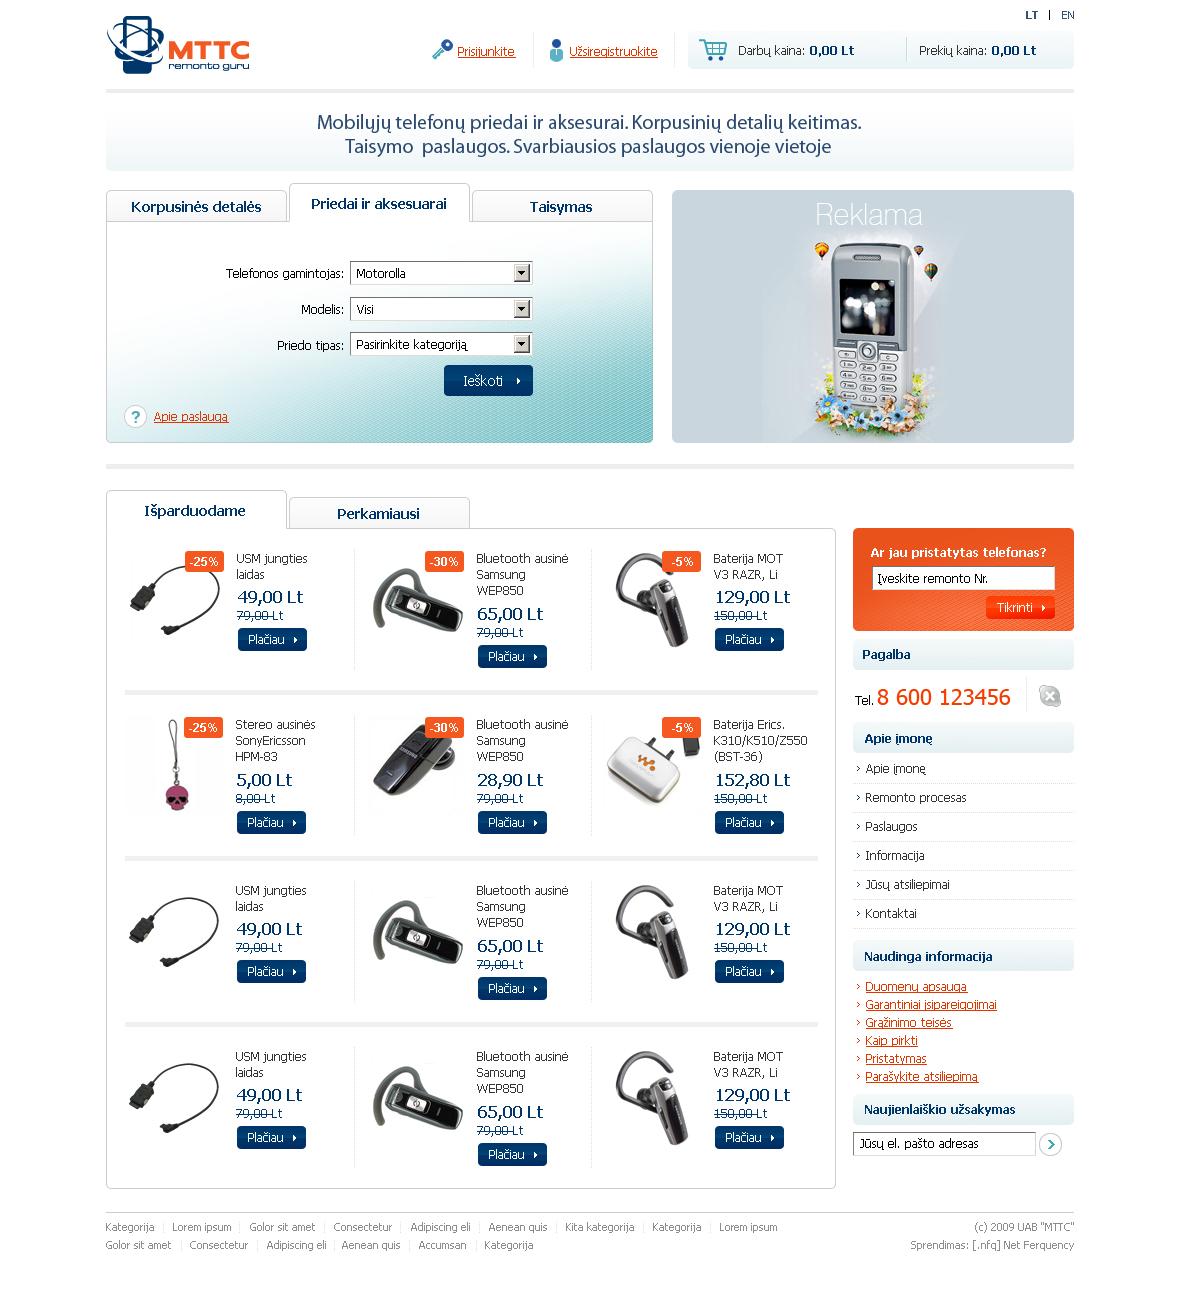 MTTC homepage design